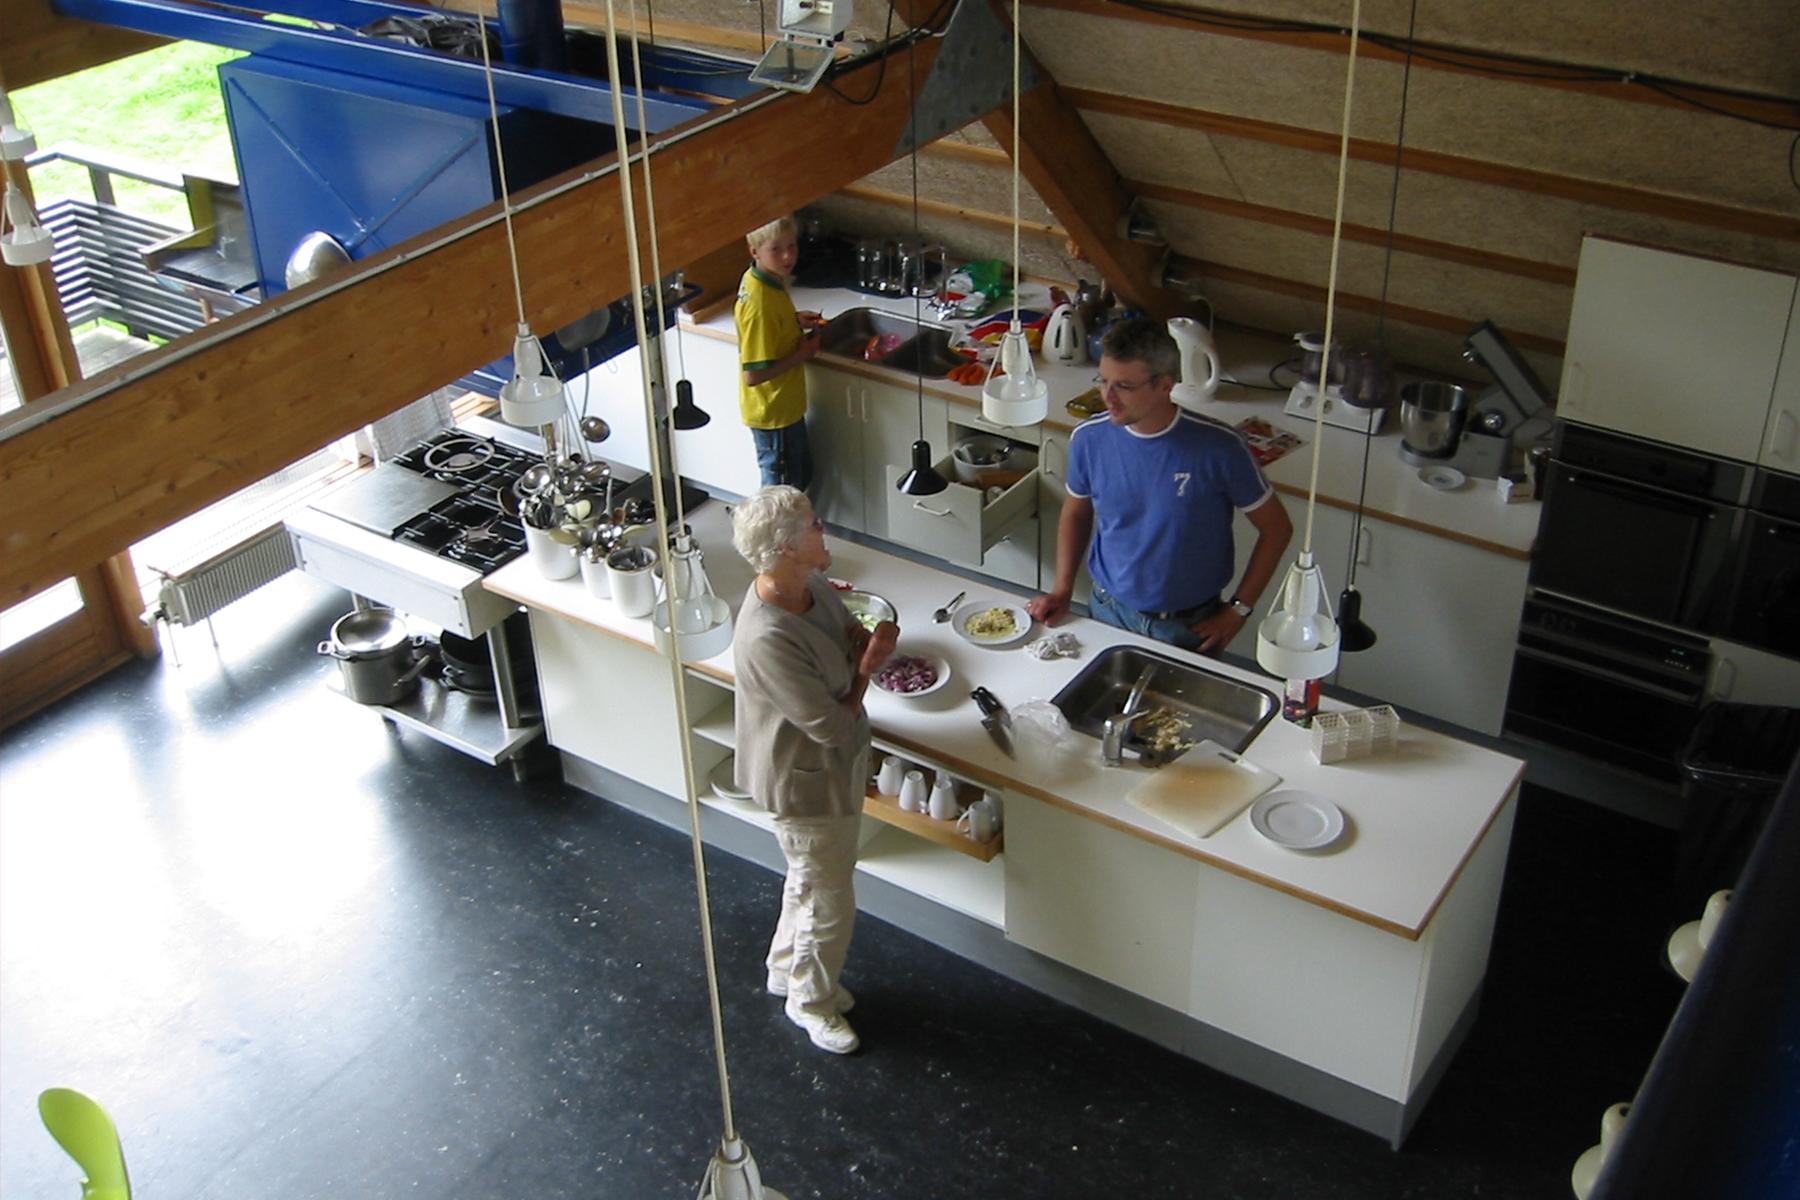 Blikfanget Cohousing  in Birkerød, DK. Designed by Tegnestuen Vandkunsten